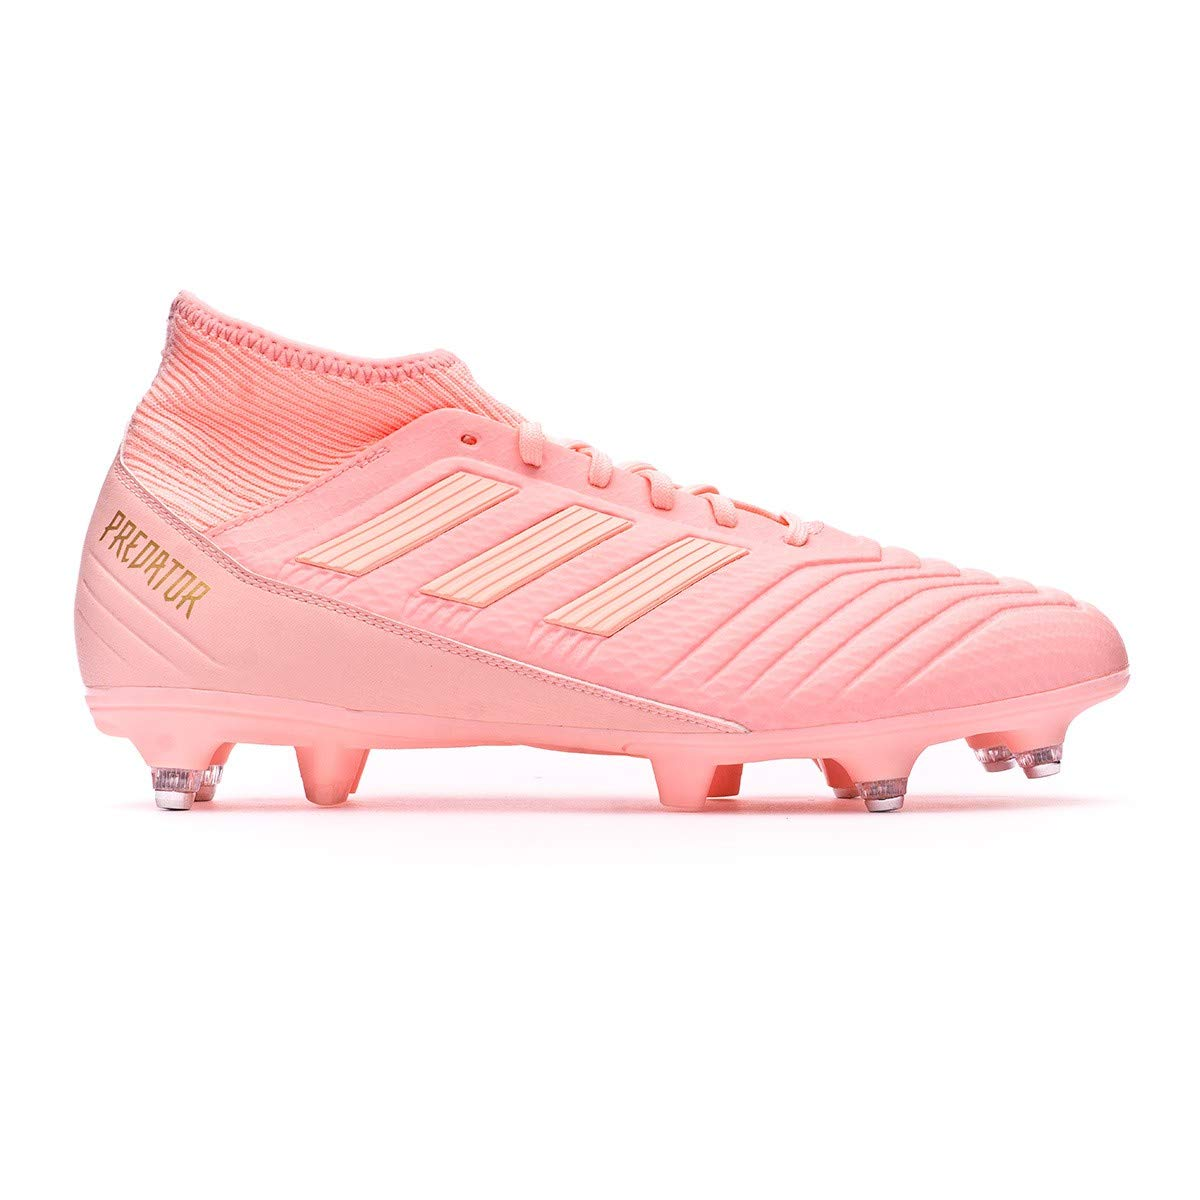 adidas Men's Predator 18.3 Sg Football Boots, Orange Narcla